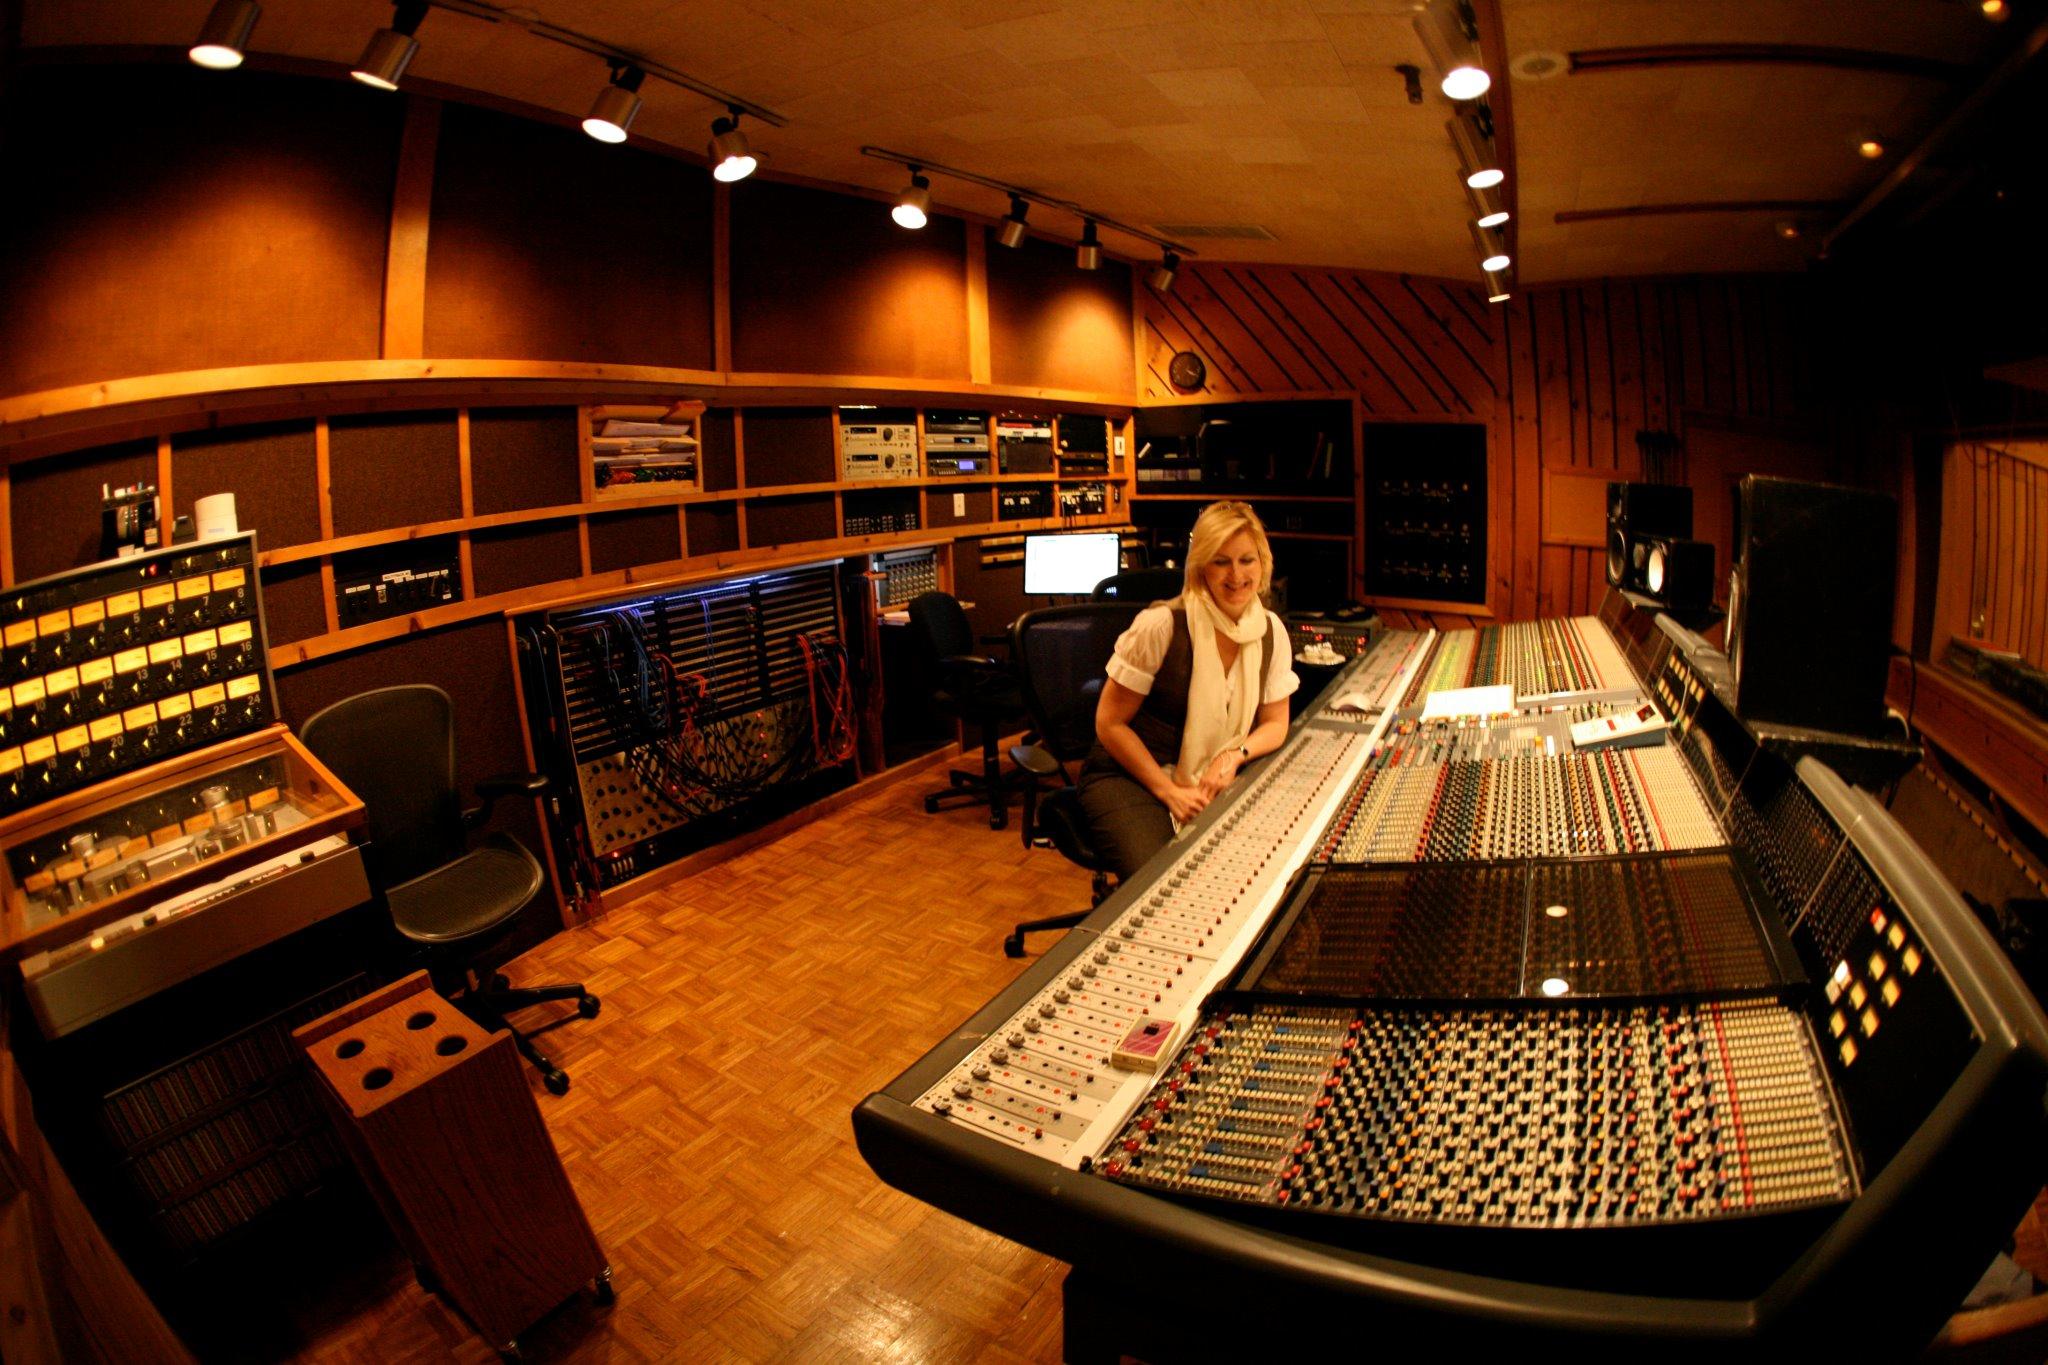 Avatar Studios, NYC